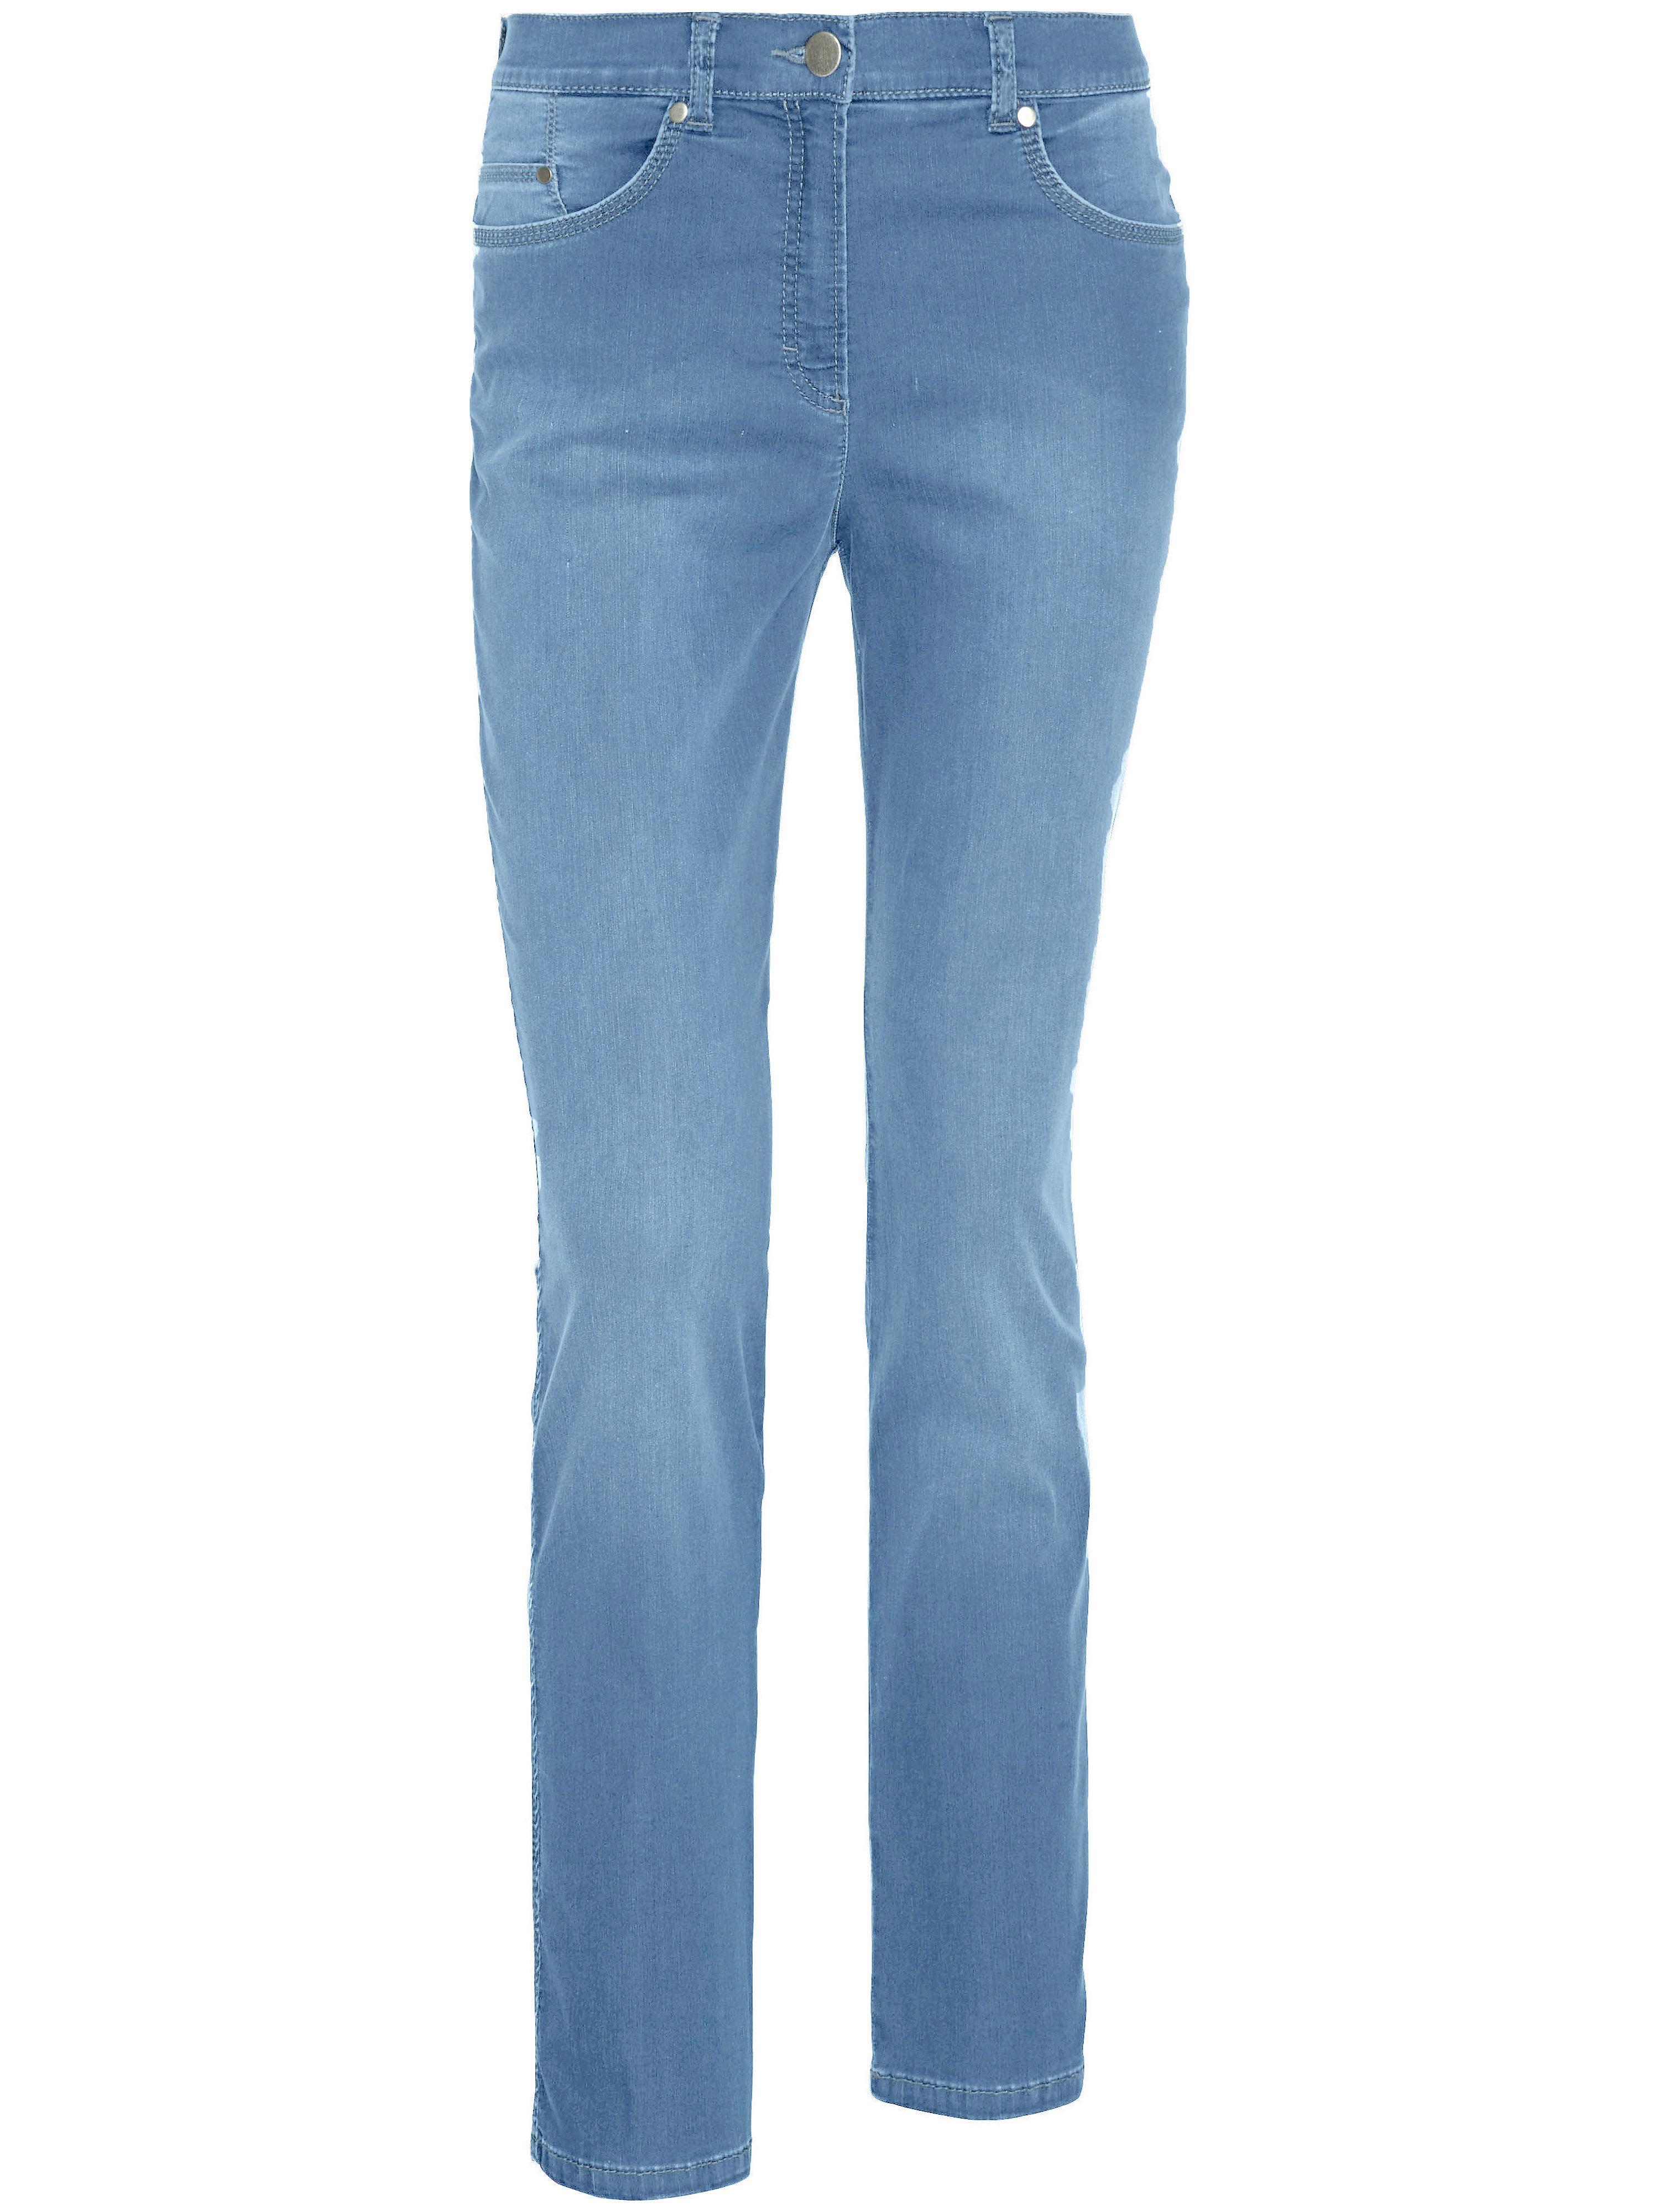 Le jean  Raphaela by Brax denim taille 54